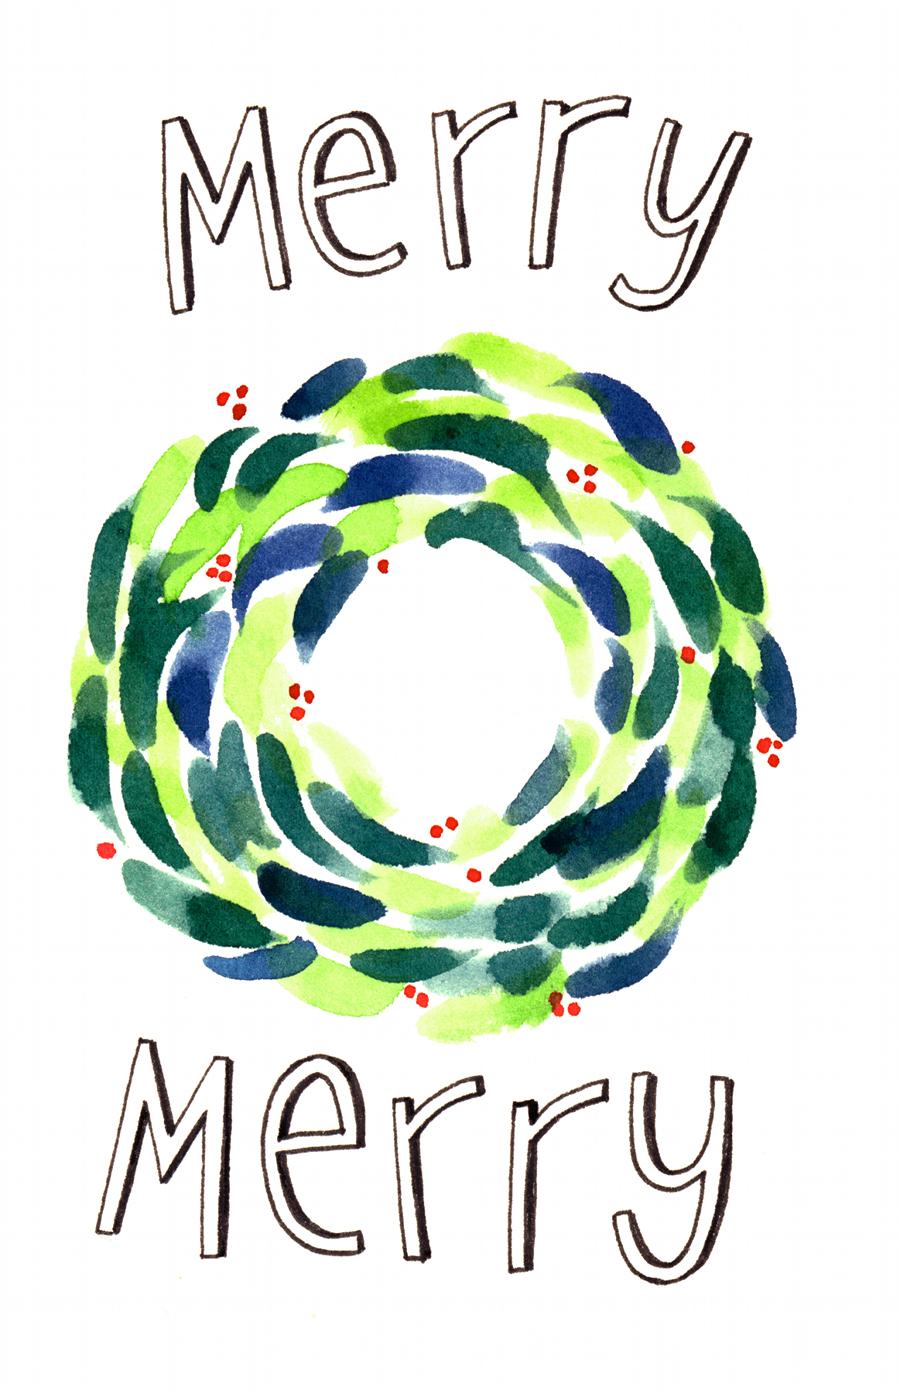 Merry Merry Wreath2_web.jpg